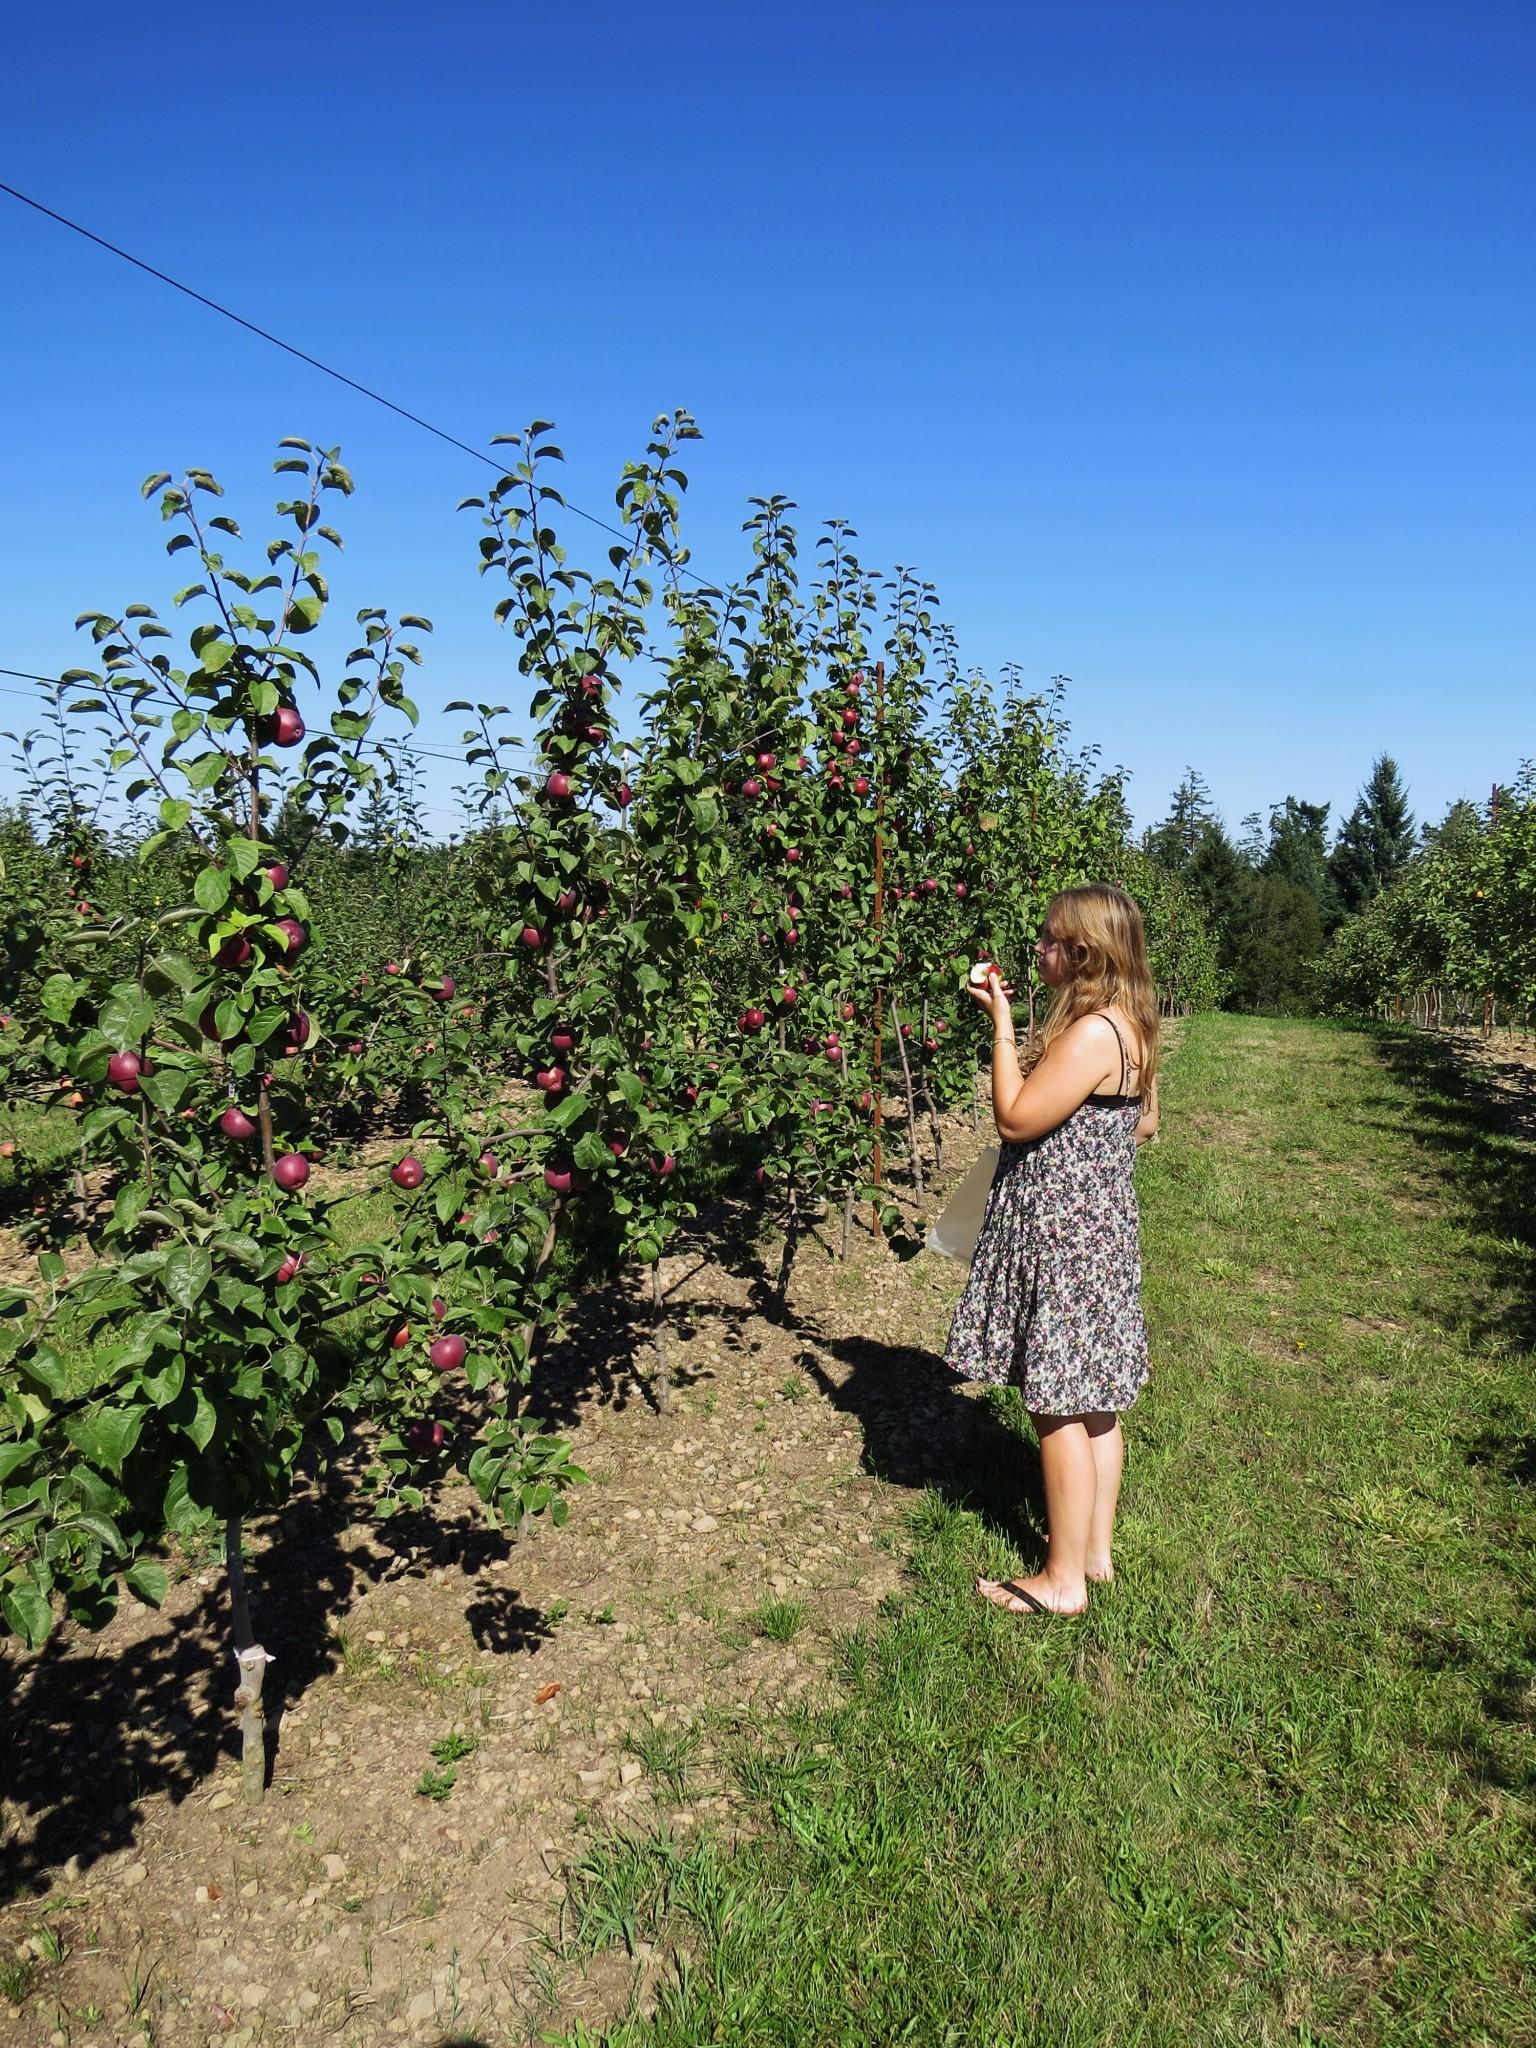 Picking apples on Gabriola Island